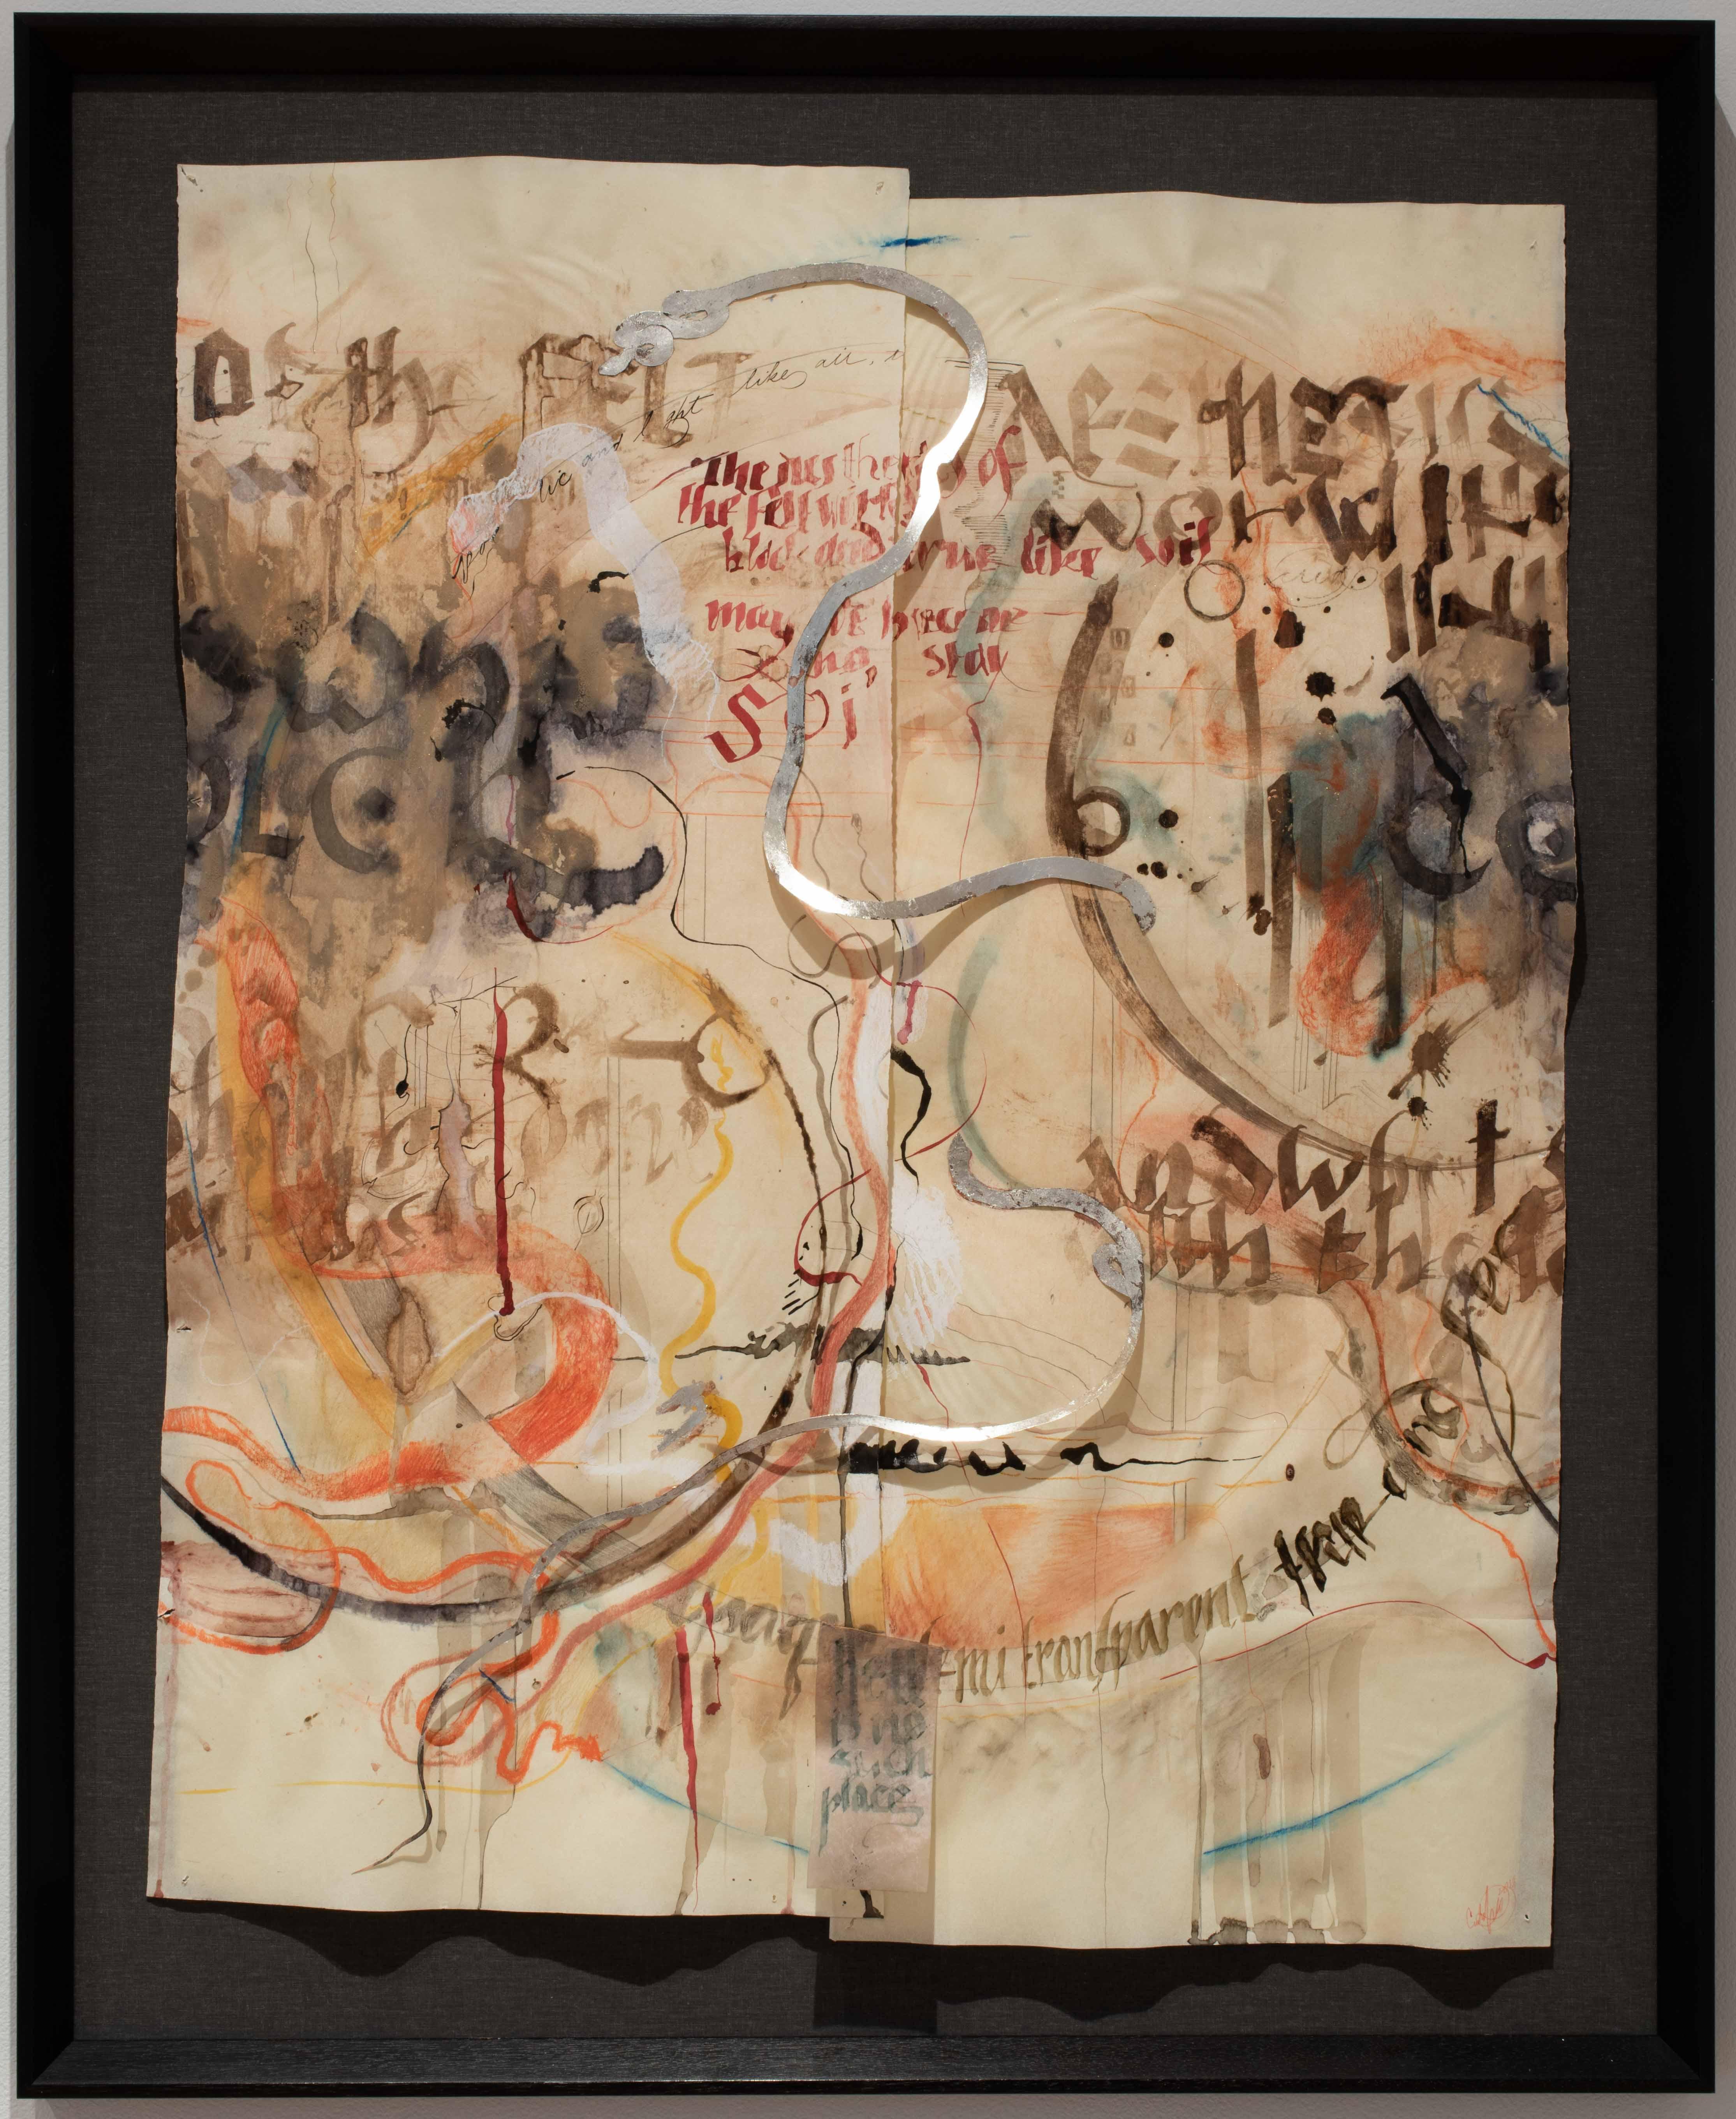 Aesthetics of the Felt World (scroll